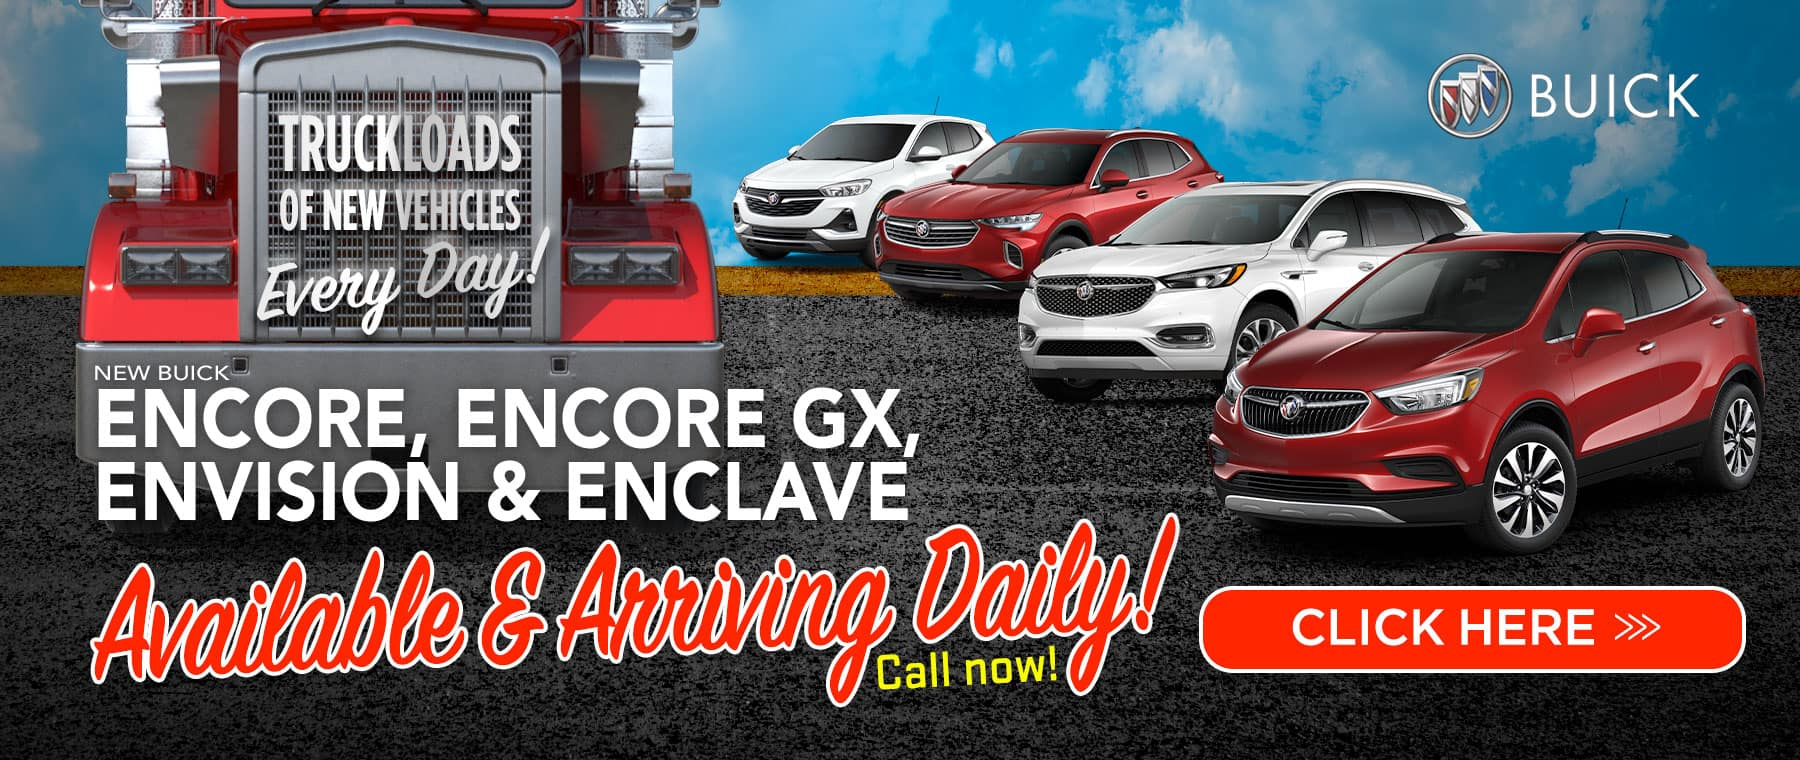 New 2021 Buick Encore, Encore GX, Envision & Enclave - Arriving Daily